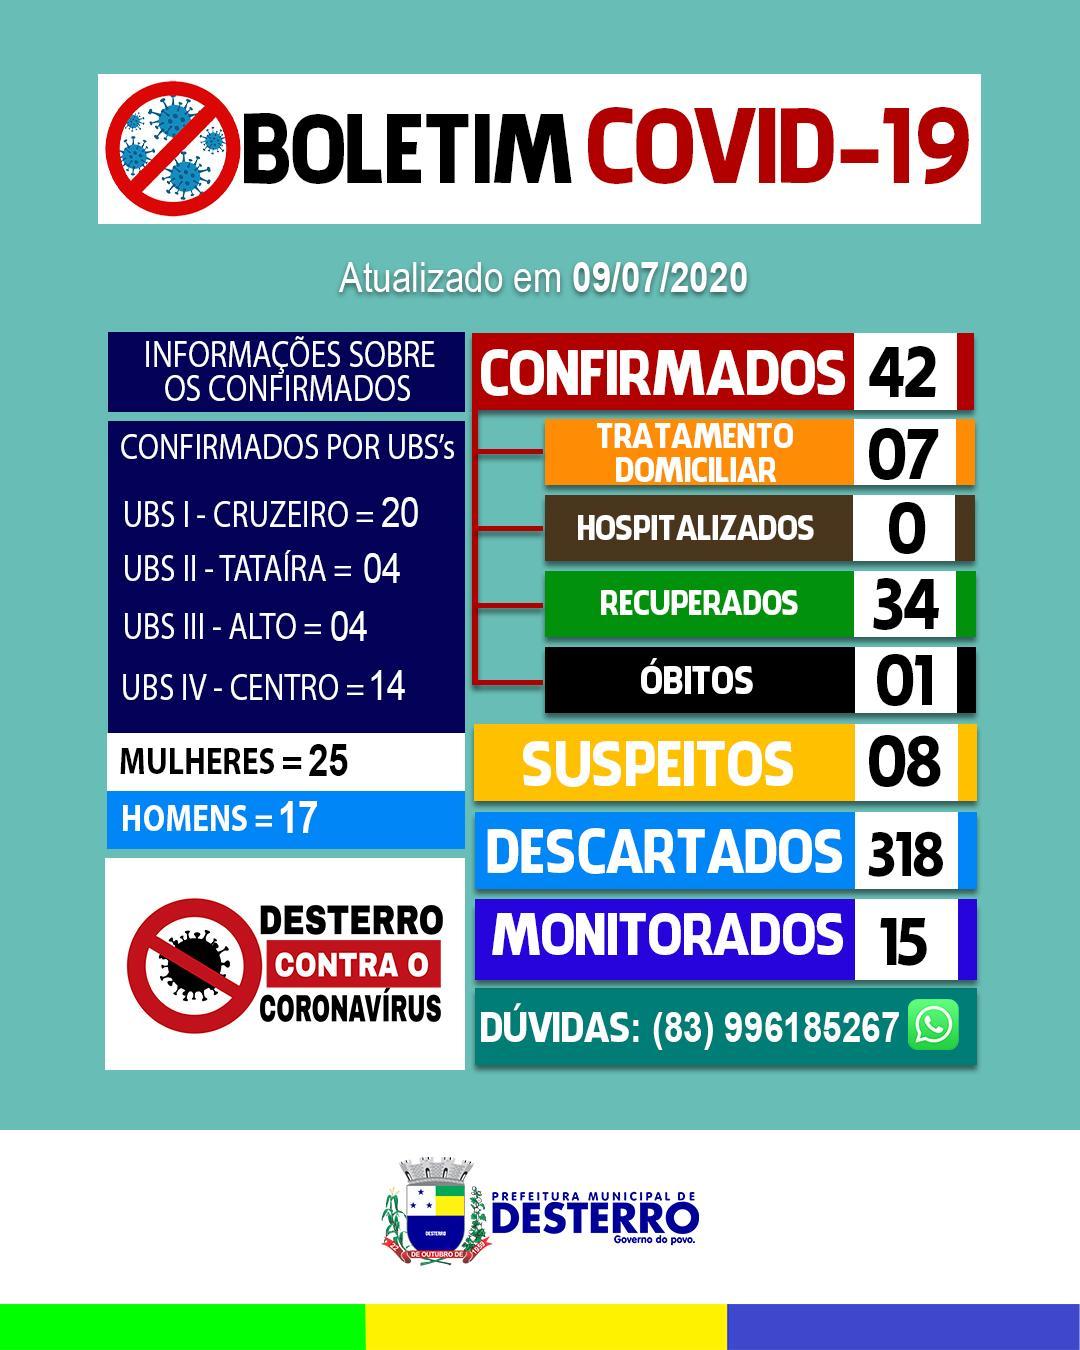 Boletim Covid-19 (09/07/2020)